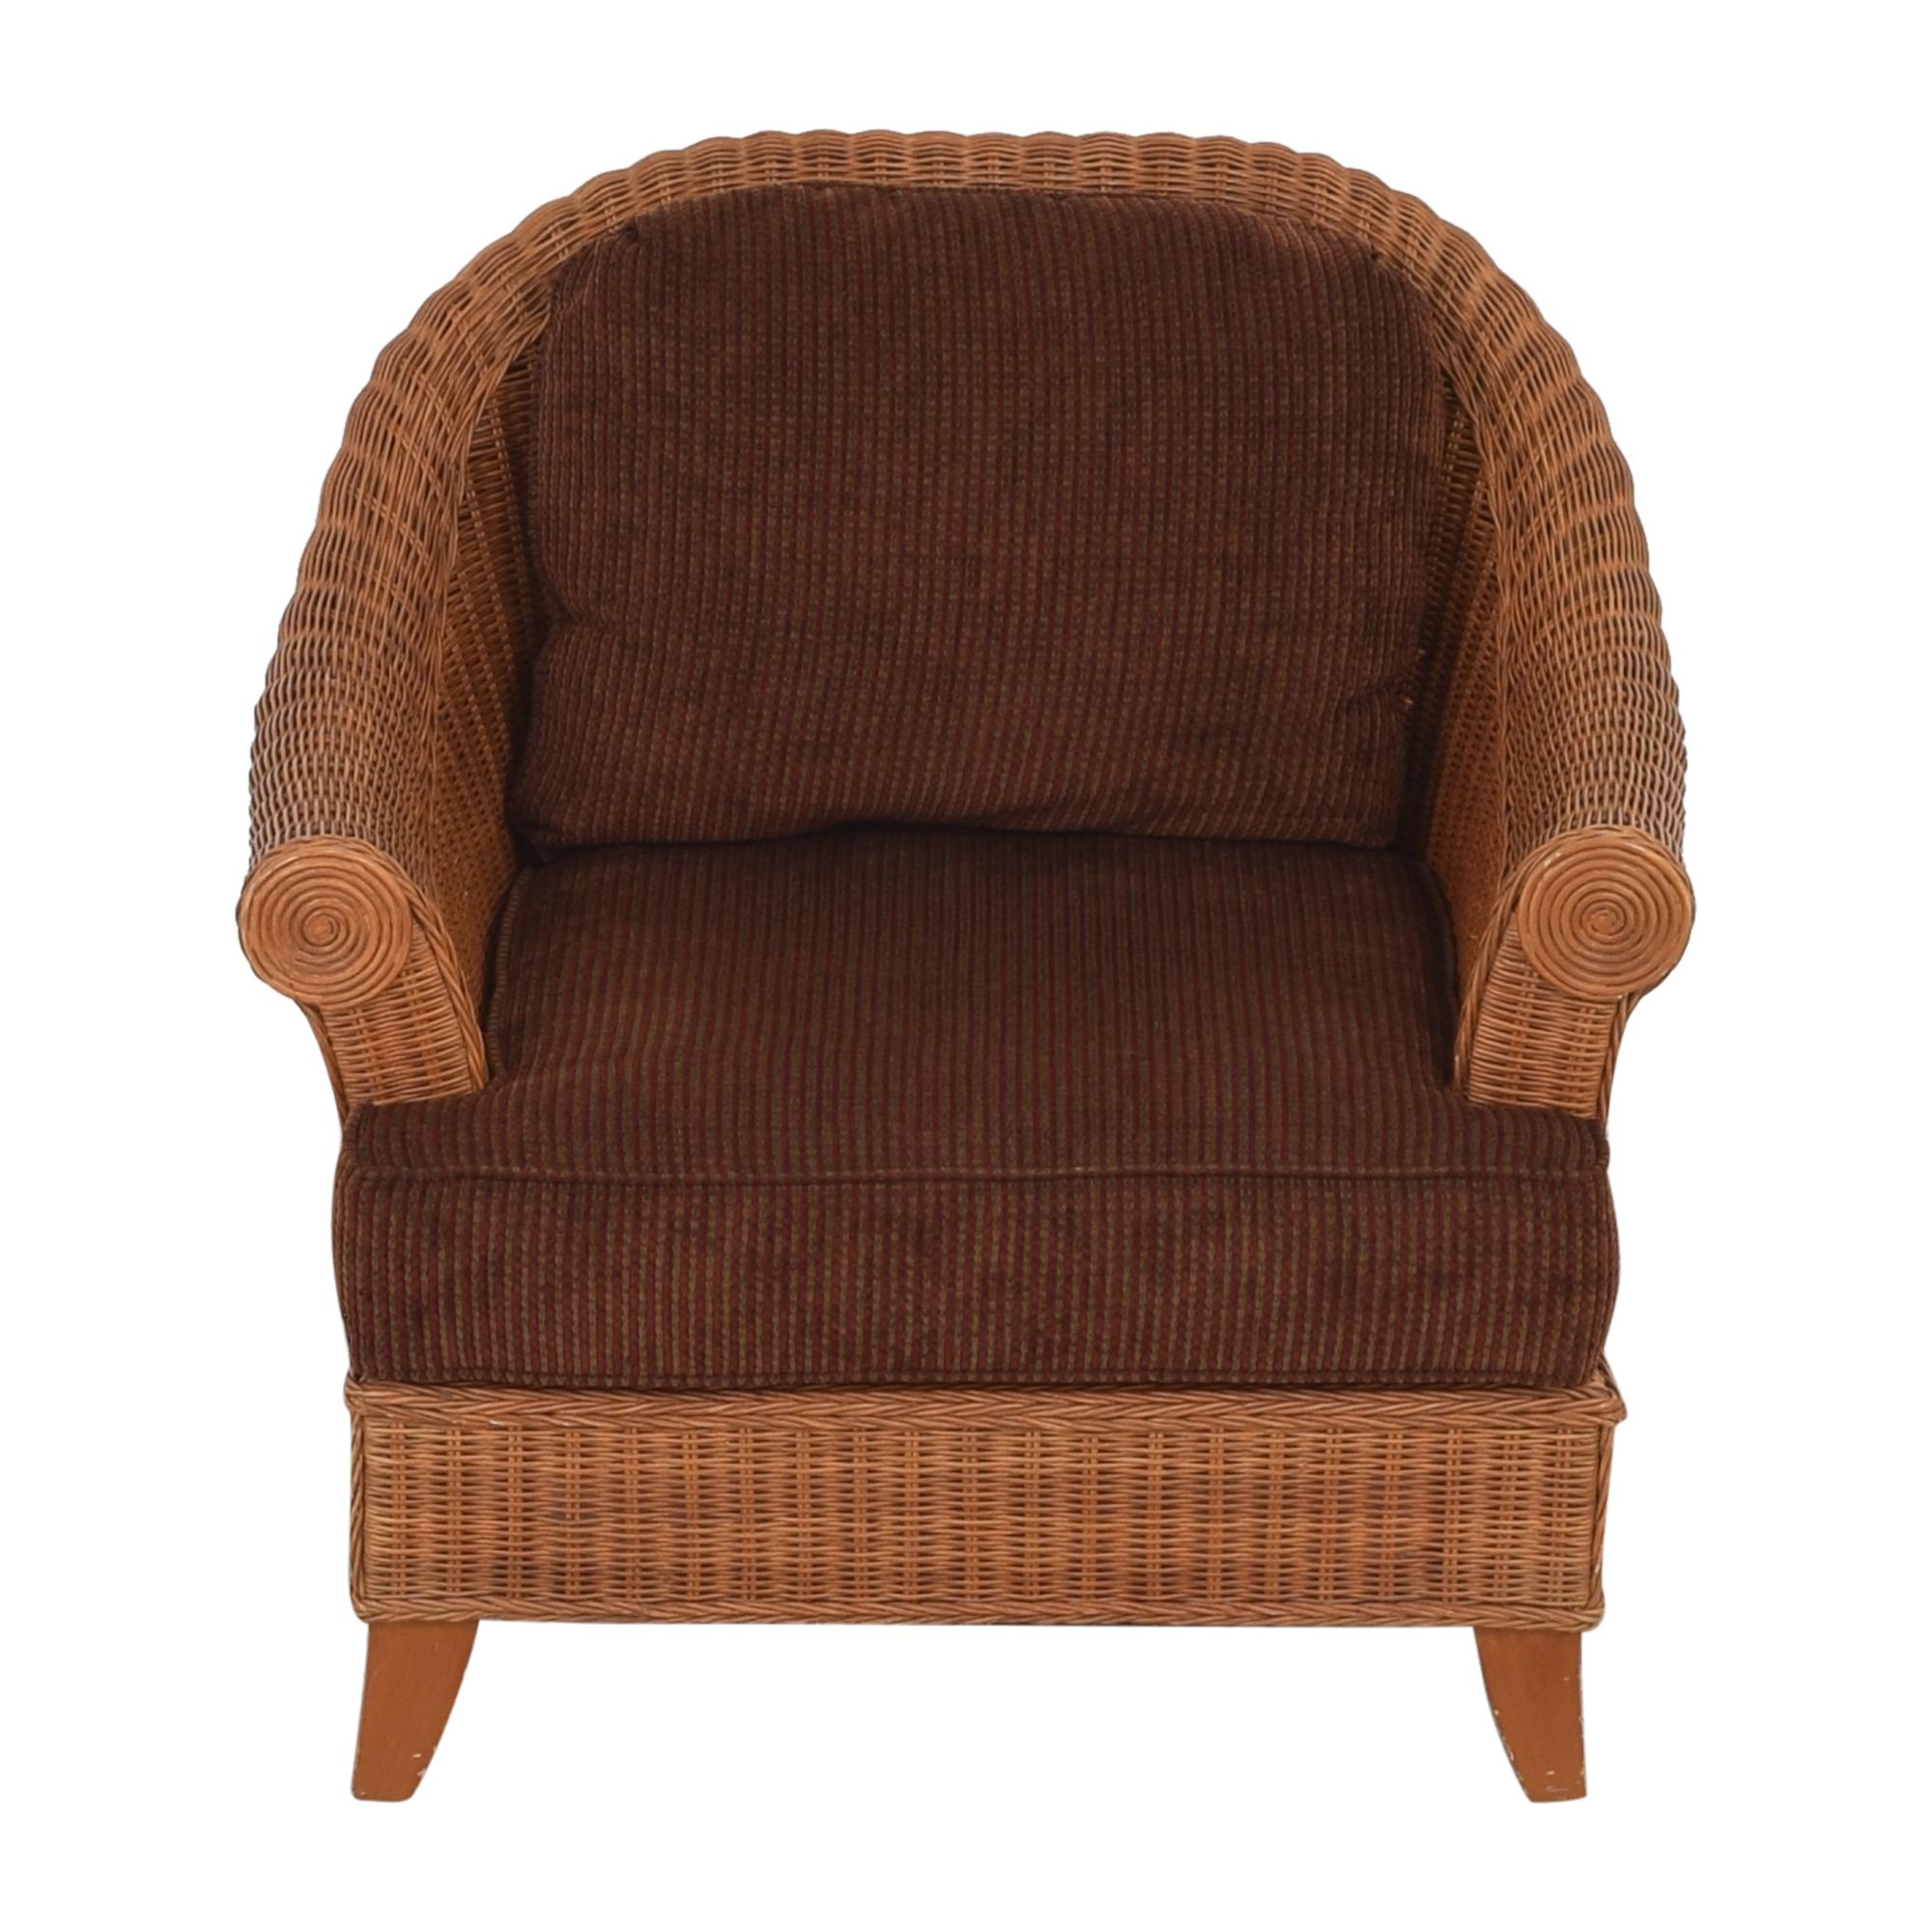 buy Ethan Allen Outdoor Accent Chair Ethan Allen Accent Chairs